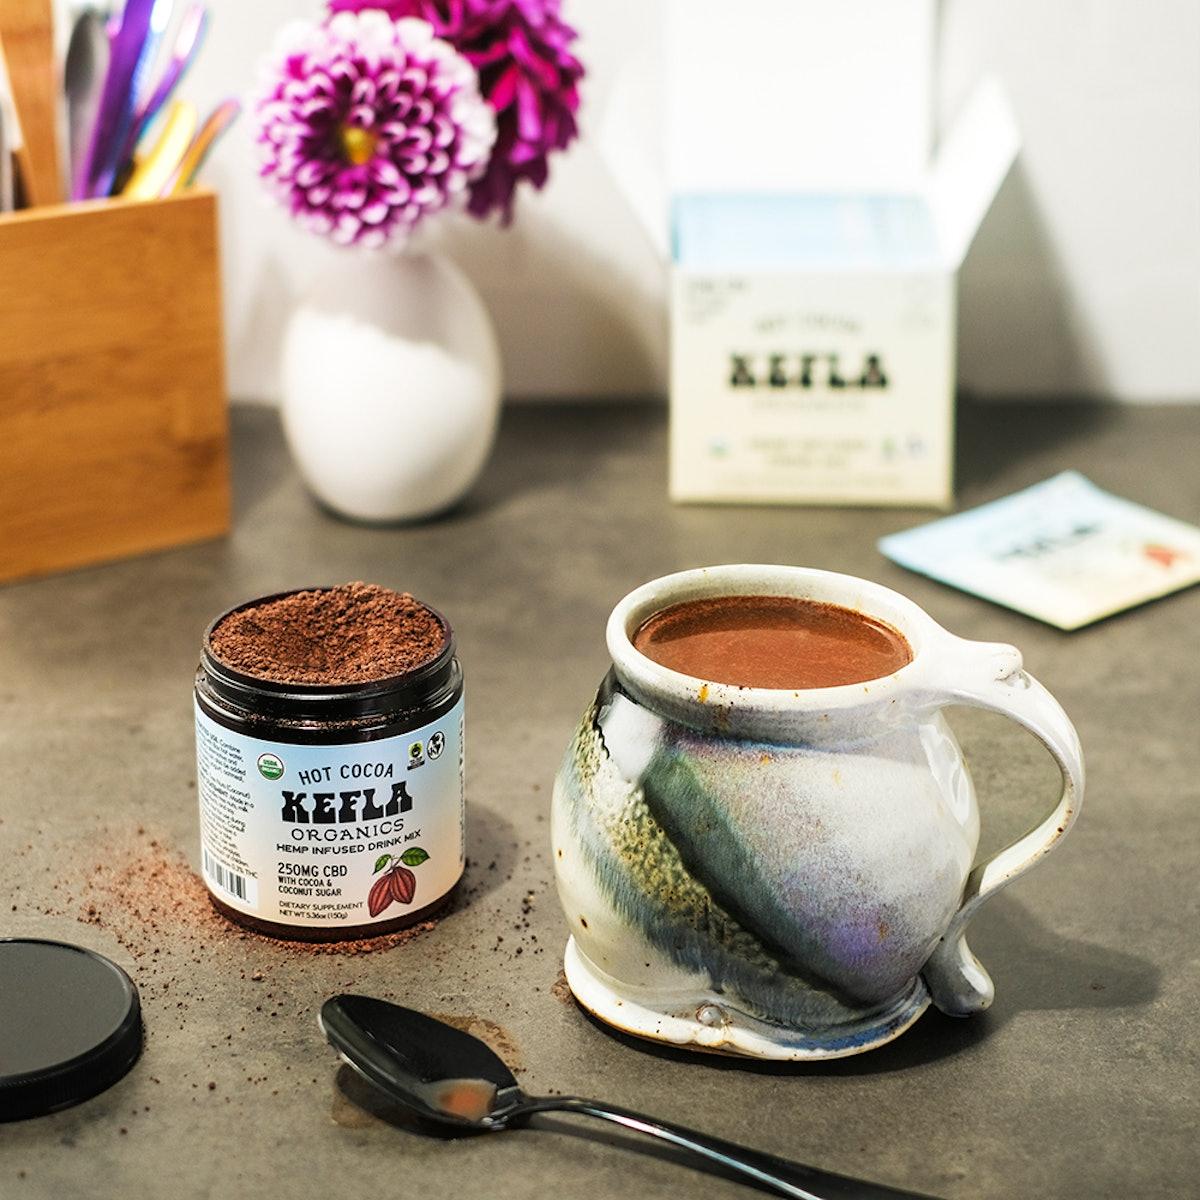 Kefla Organics CBD Hot Cocoa